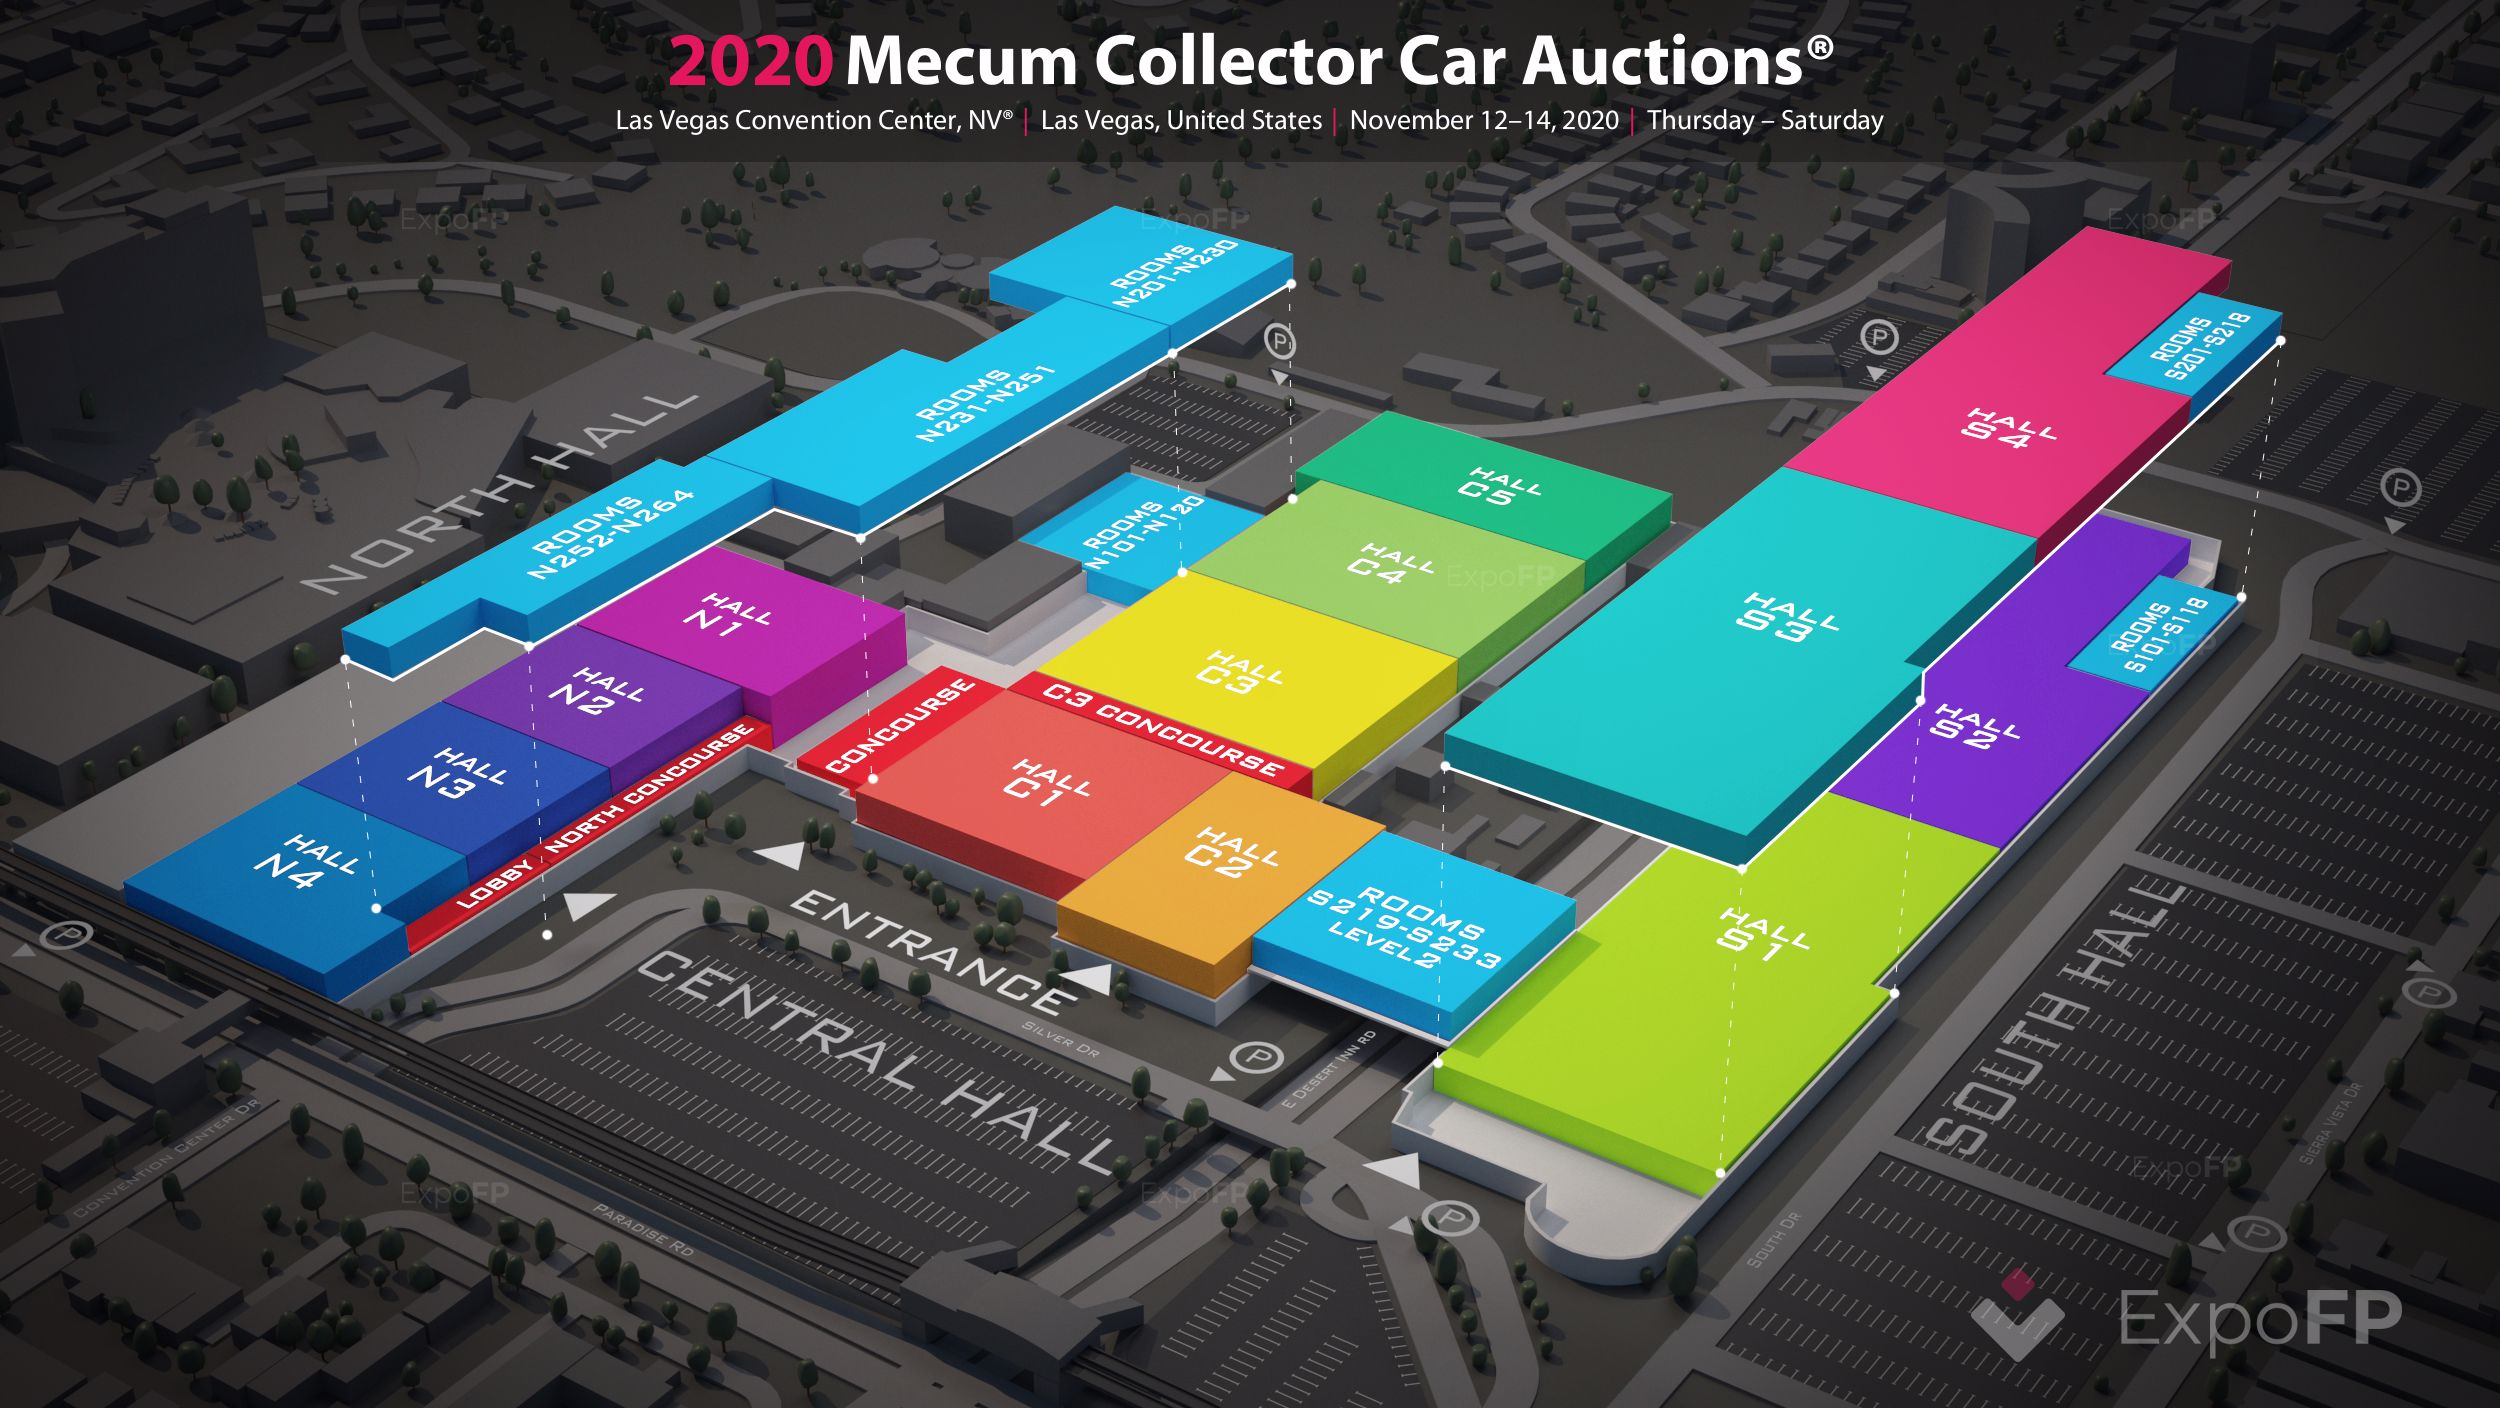 Mecum collector car auctions 2020 las vegas   las vegas convention center floorplan   mecum collector car auctions 2020 las vegas